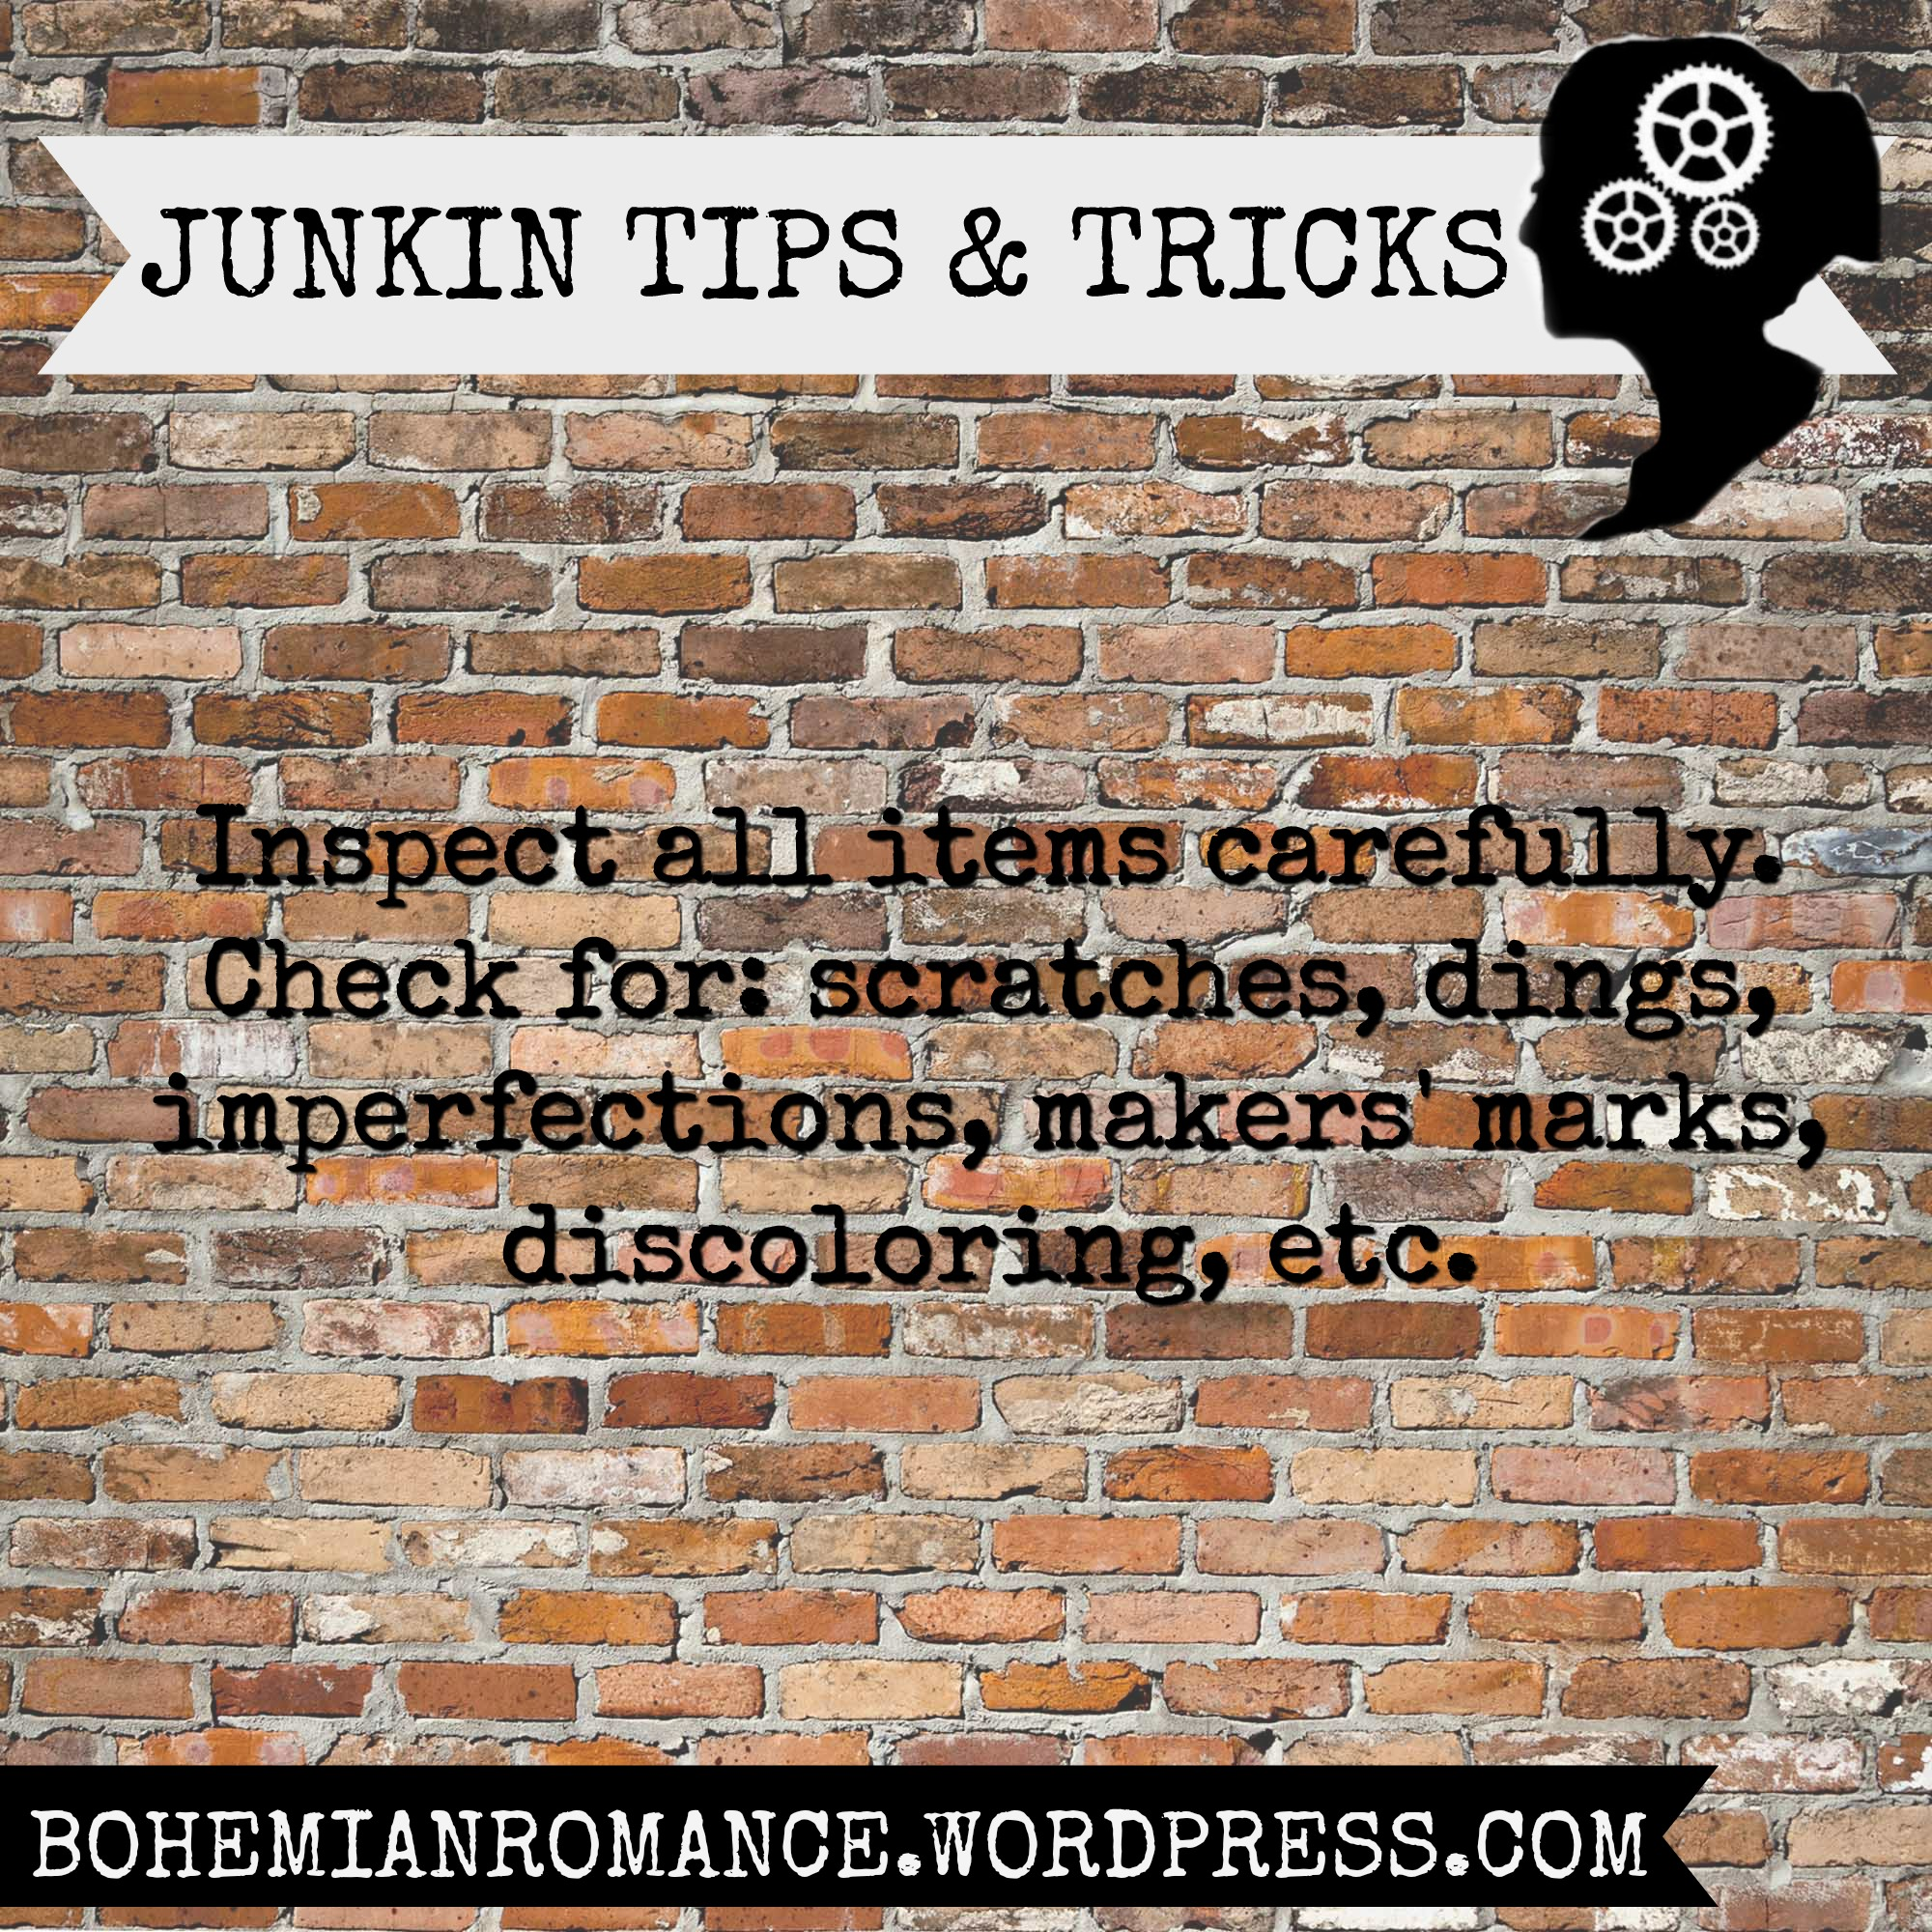 35-junkin-tips-tricks-template